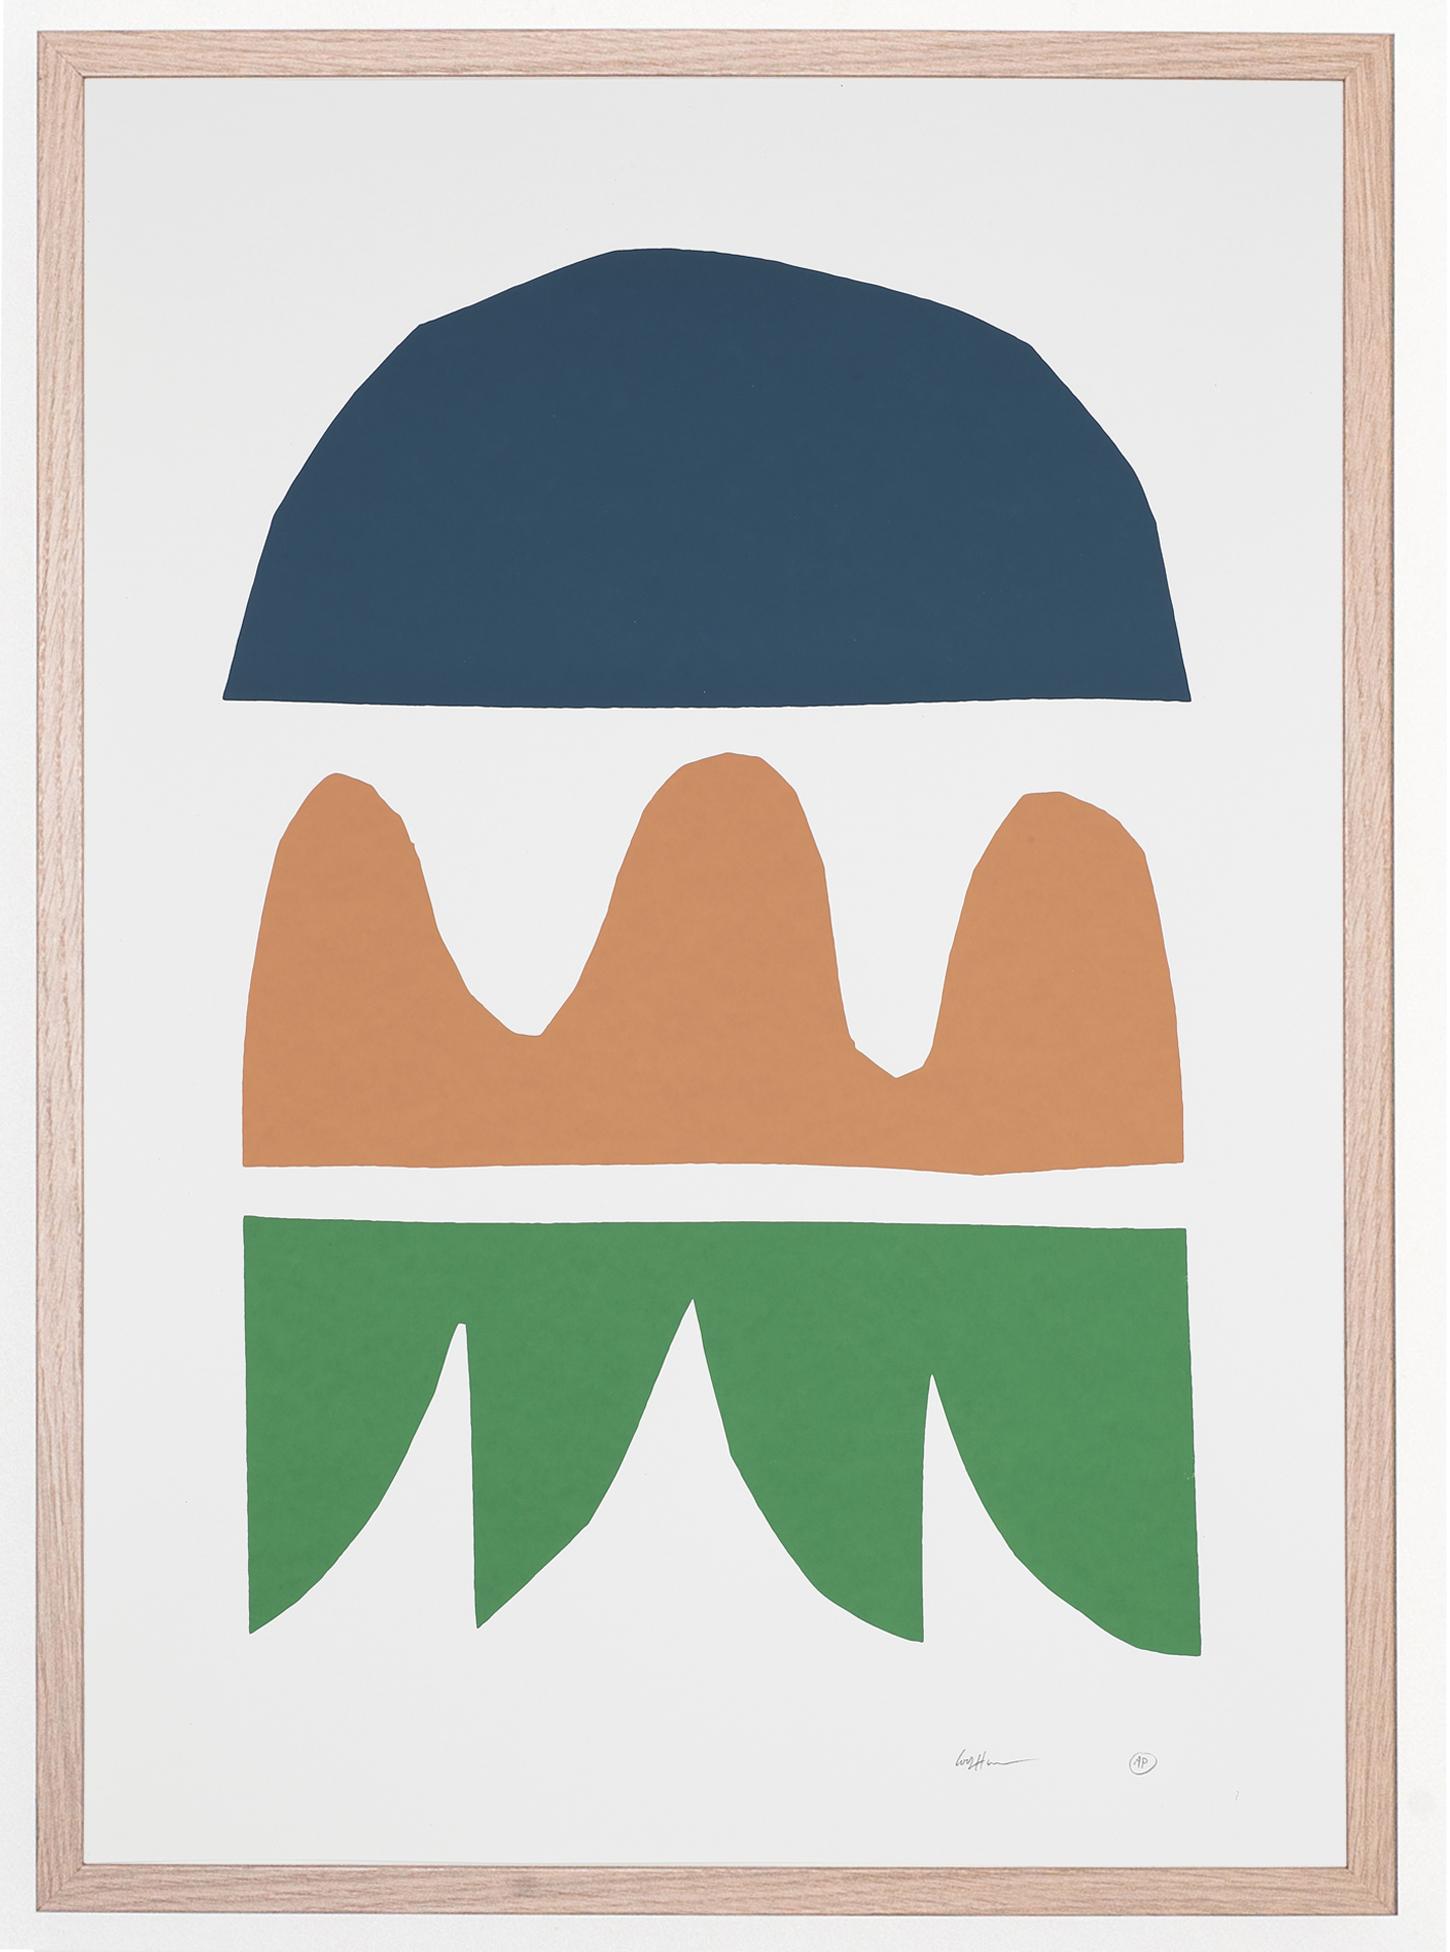 Jaunt #50 - Cody Hudson, Costa Rica November 2018 3 Colour Silkscreen Print, 50cm x 70cm